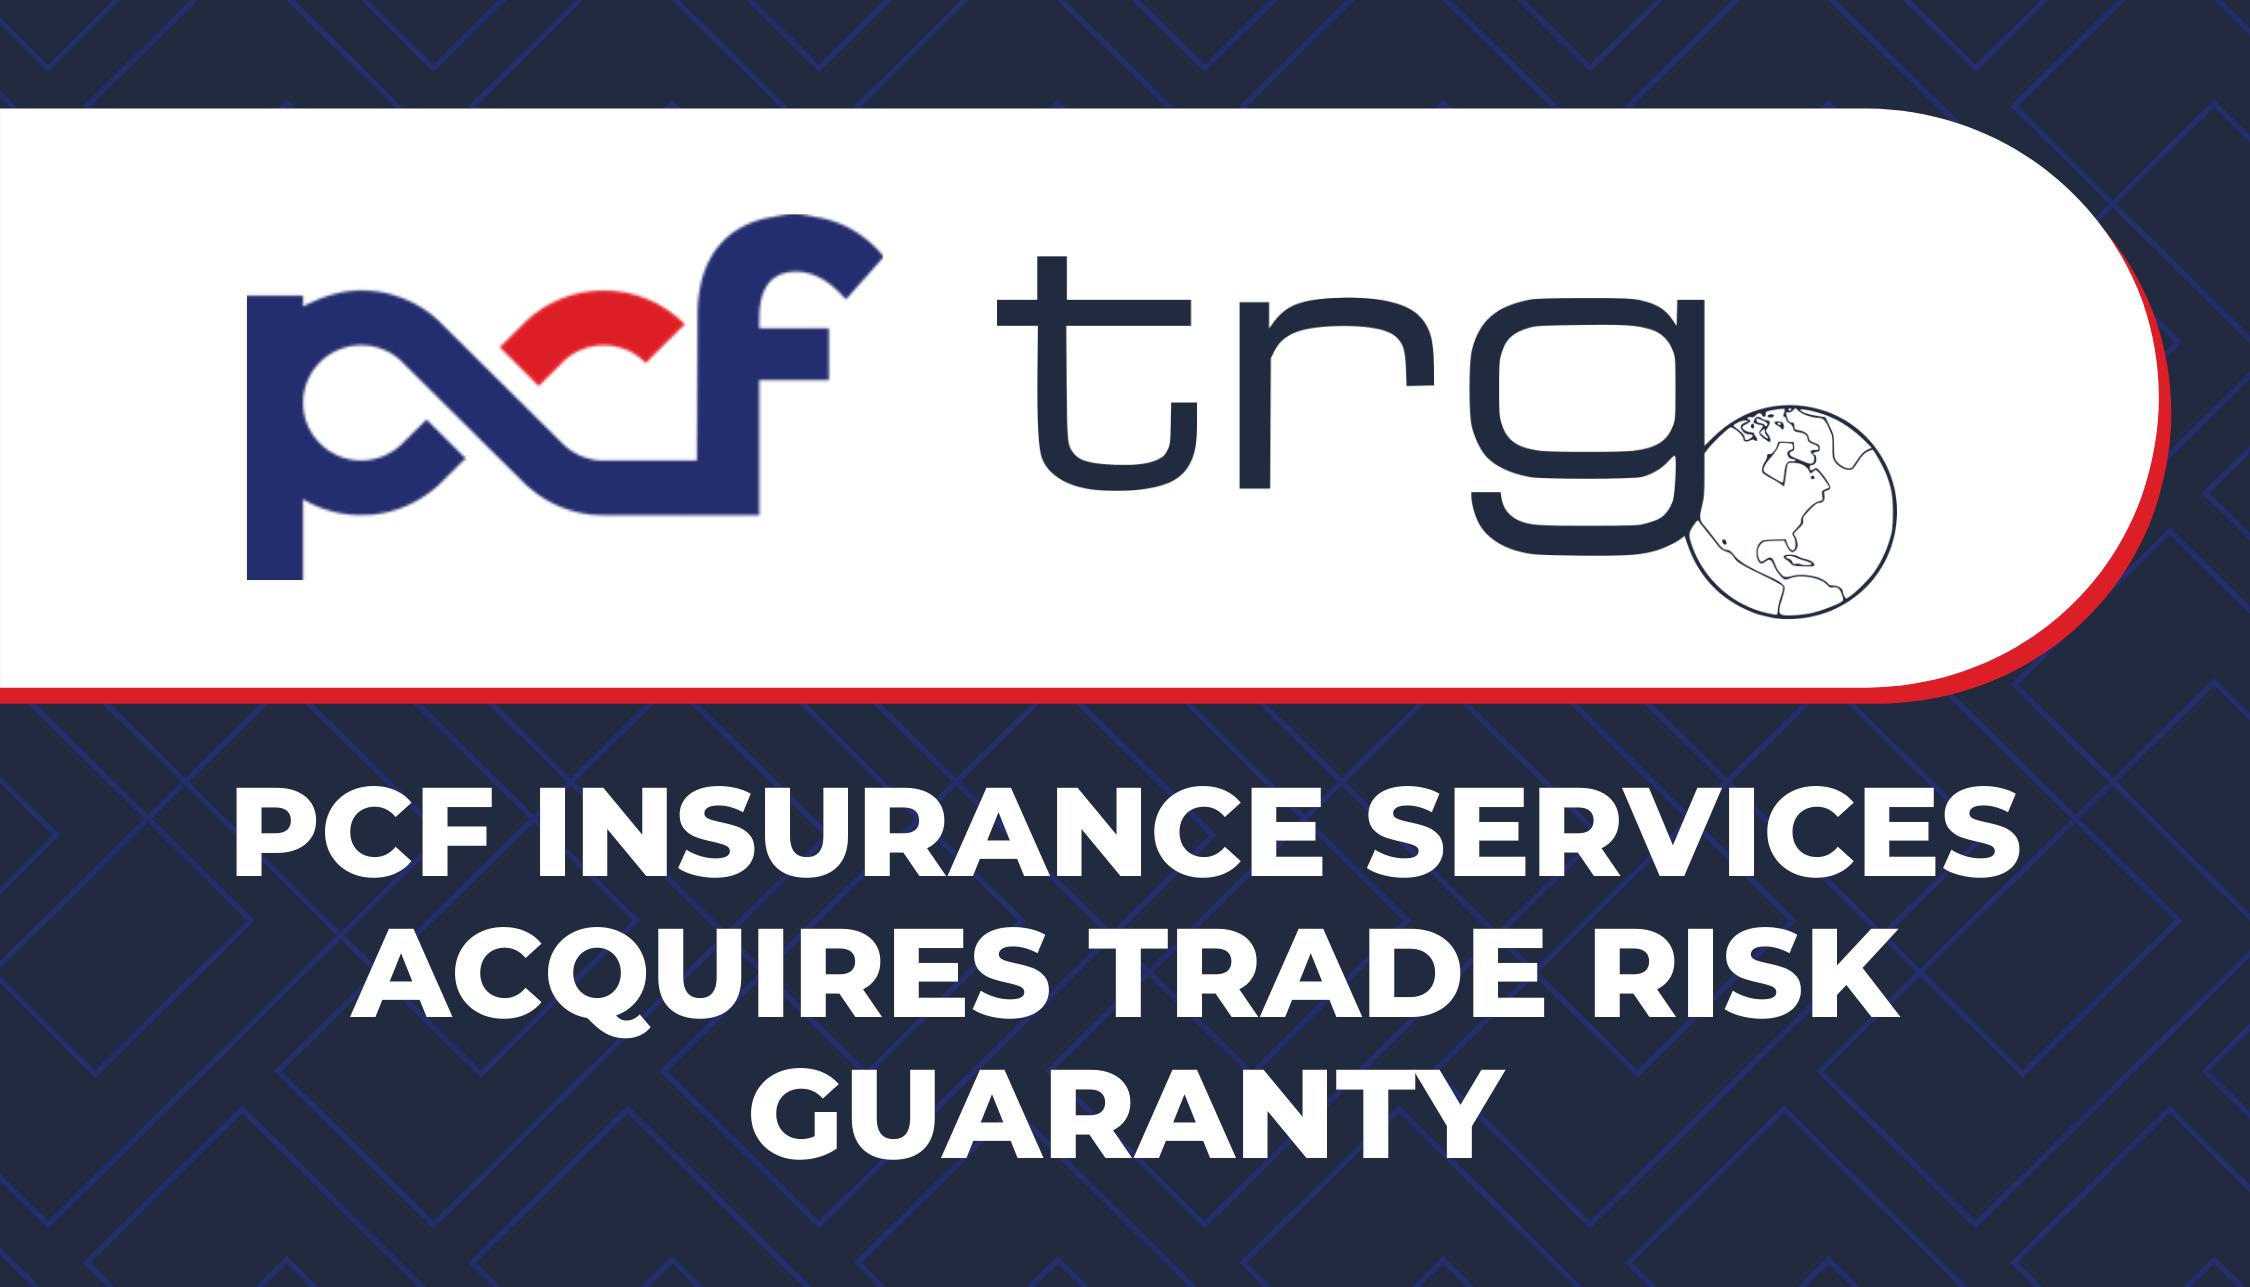 PCF Insurance Services Acquires Trade Risk Guaranty